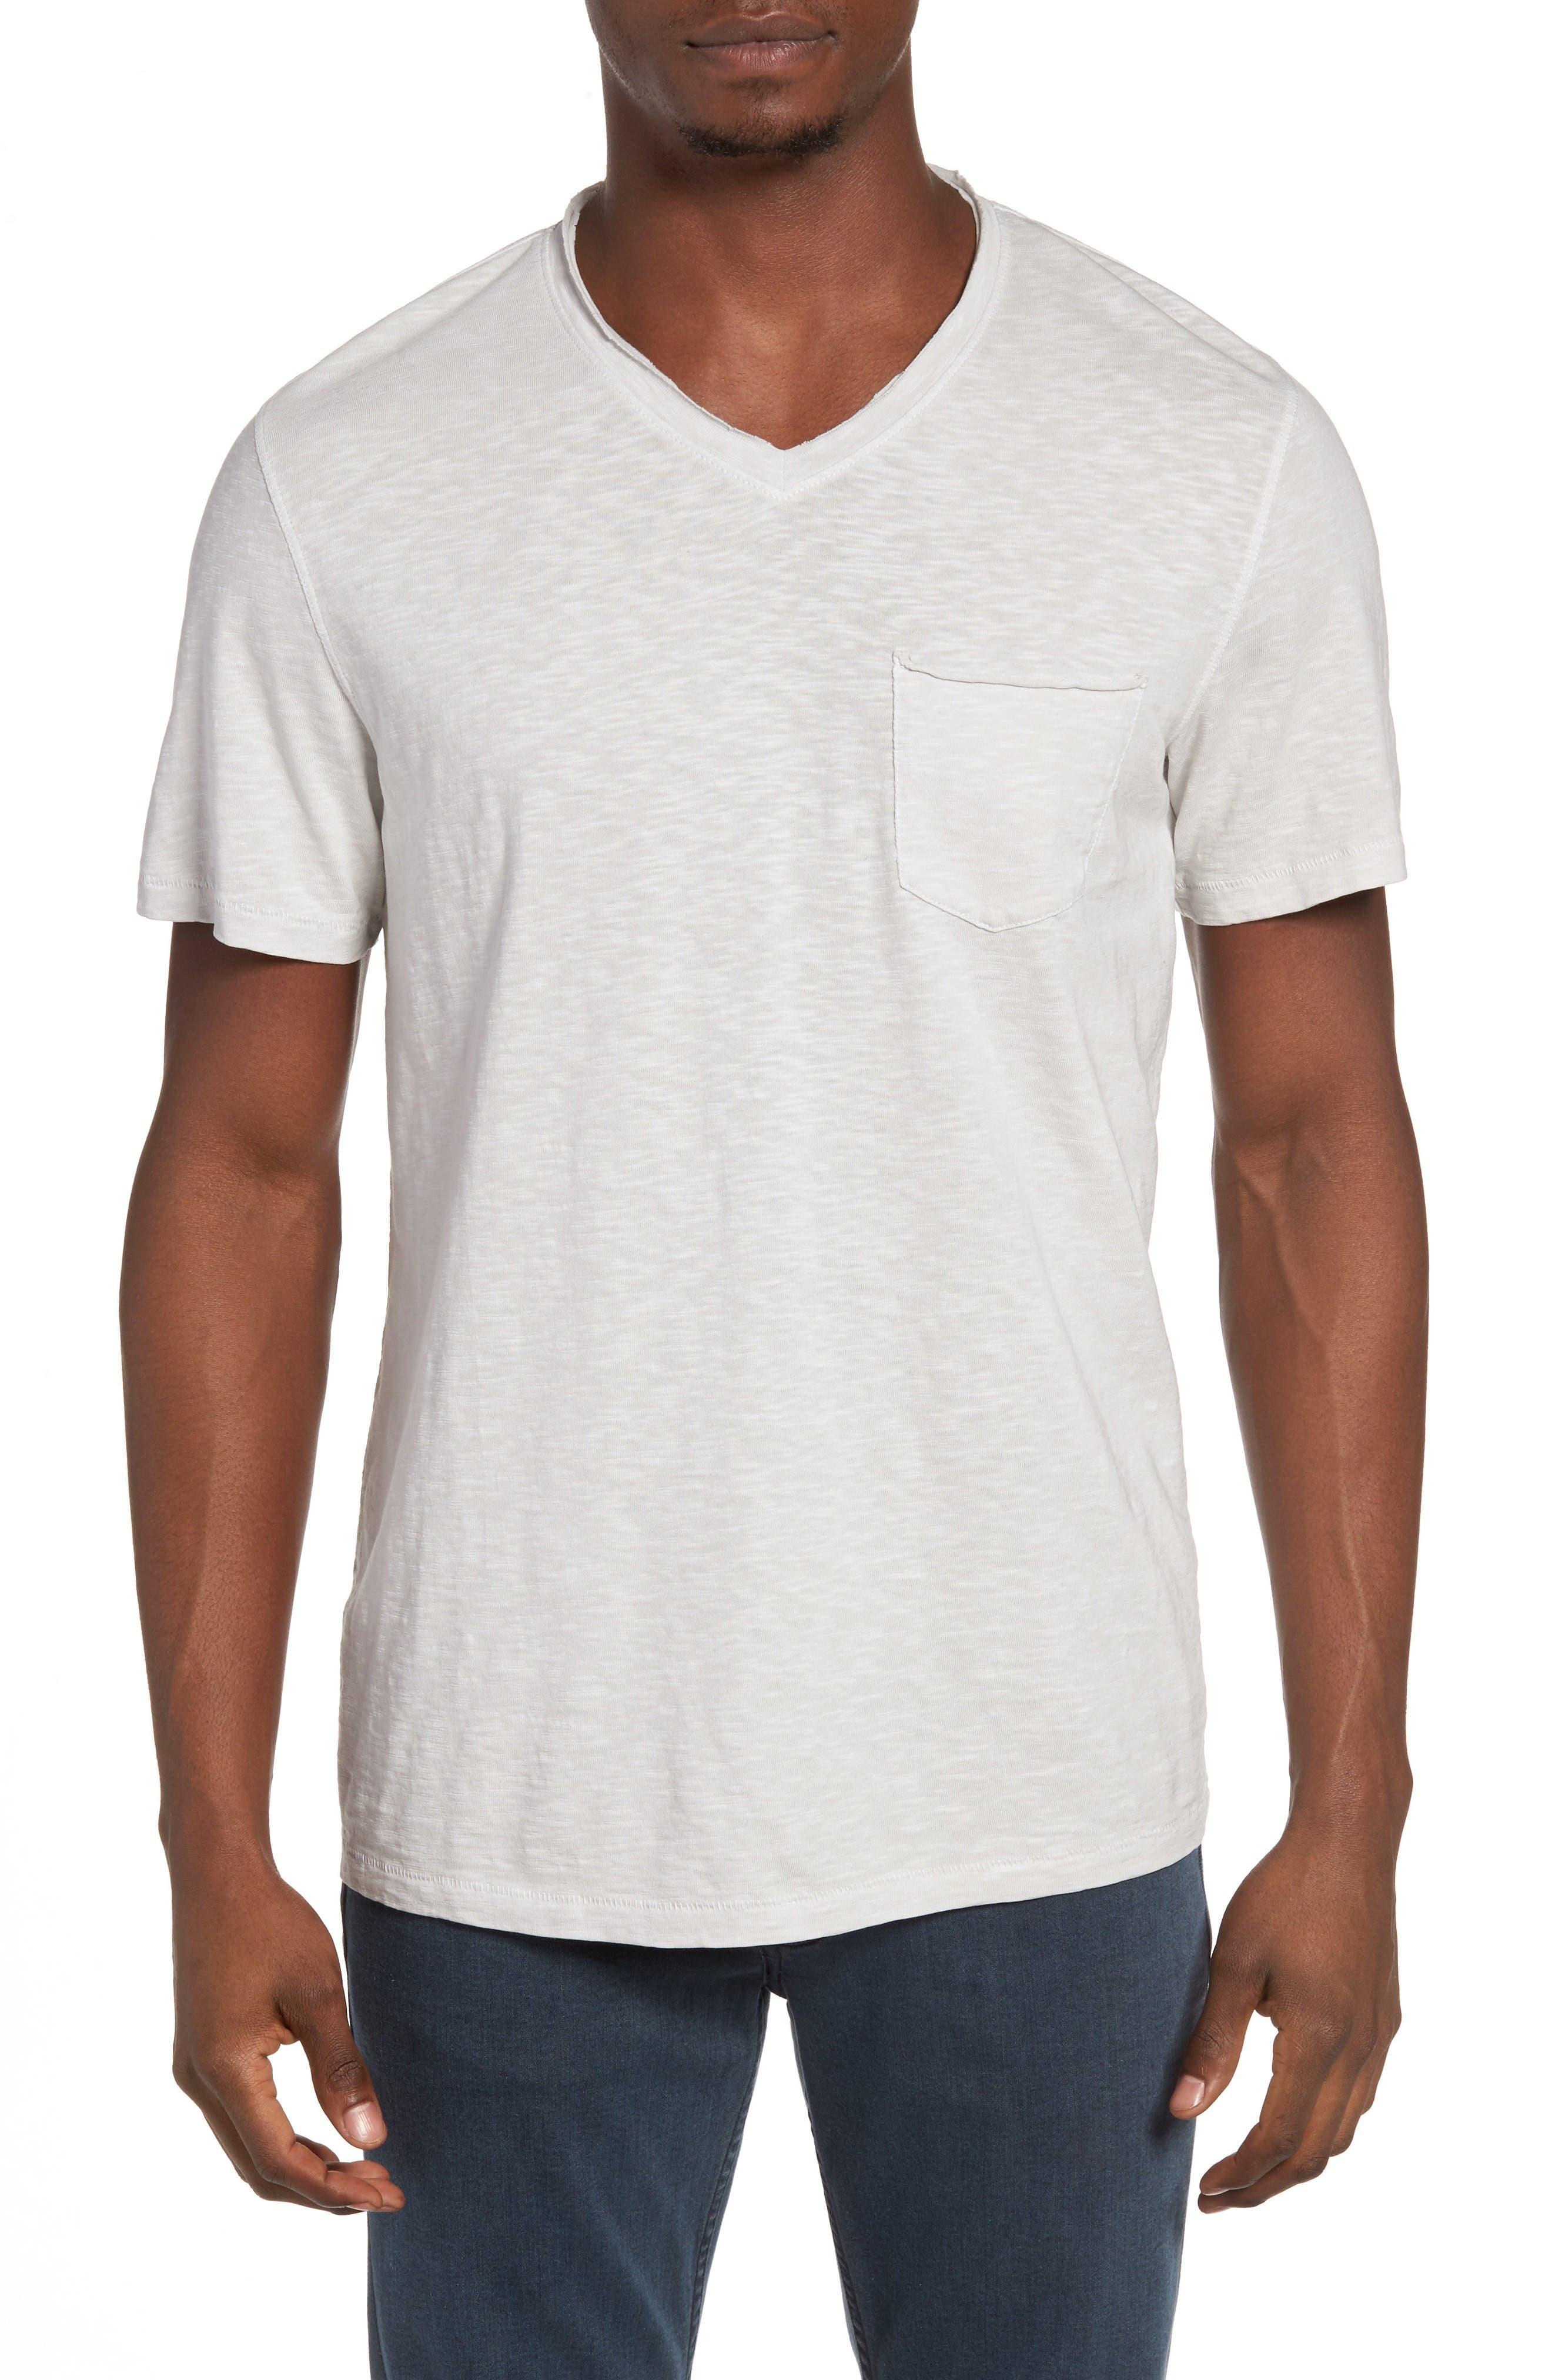 Treasure & Bond Trim Fit Slub V-Neck Pocket T-Shirt